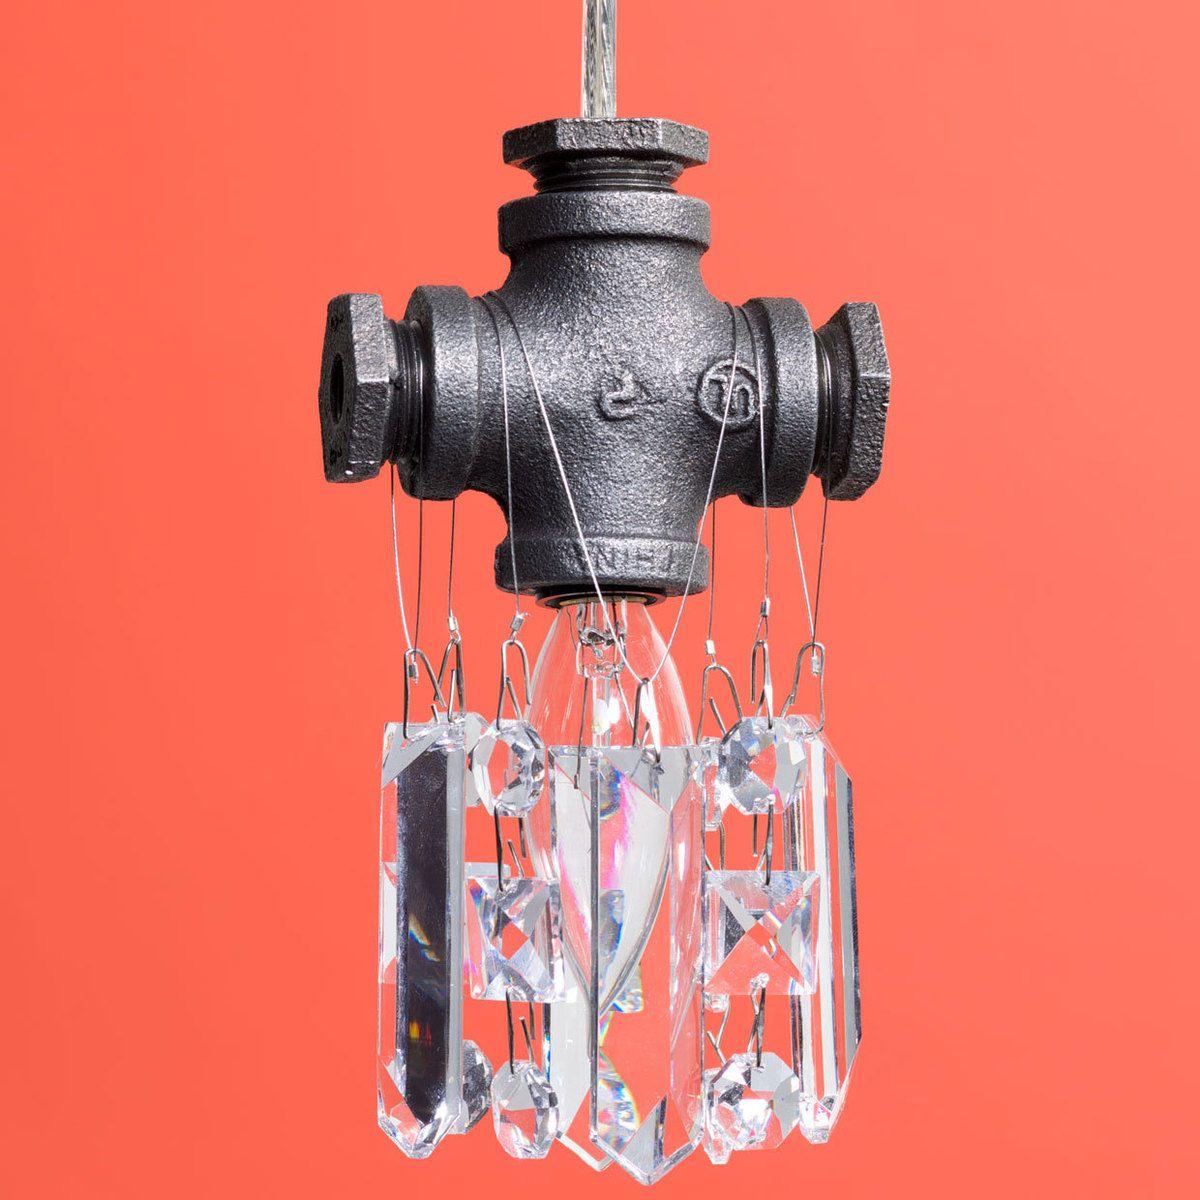 Tribeca single bulb chandelier michael mchale designs apt tribeca single bulb chandelier michael mchale designs arubaitofo Image collections